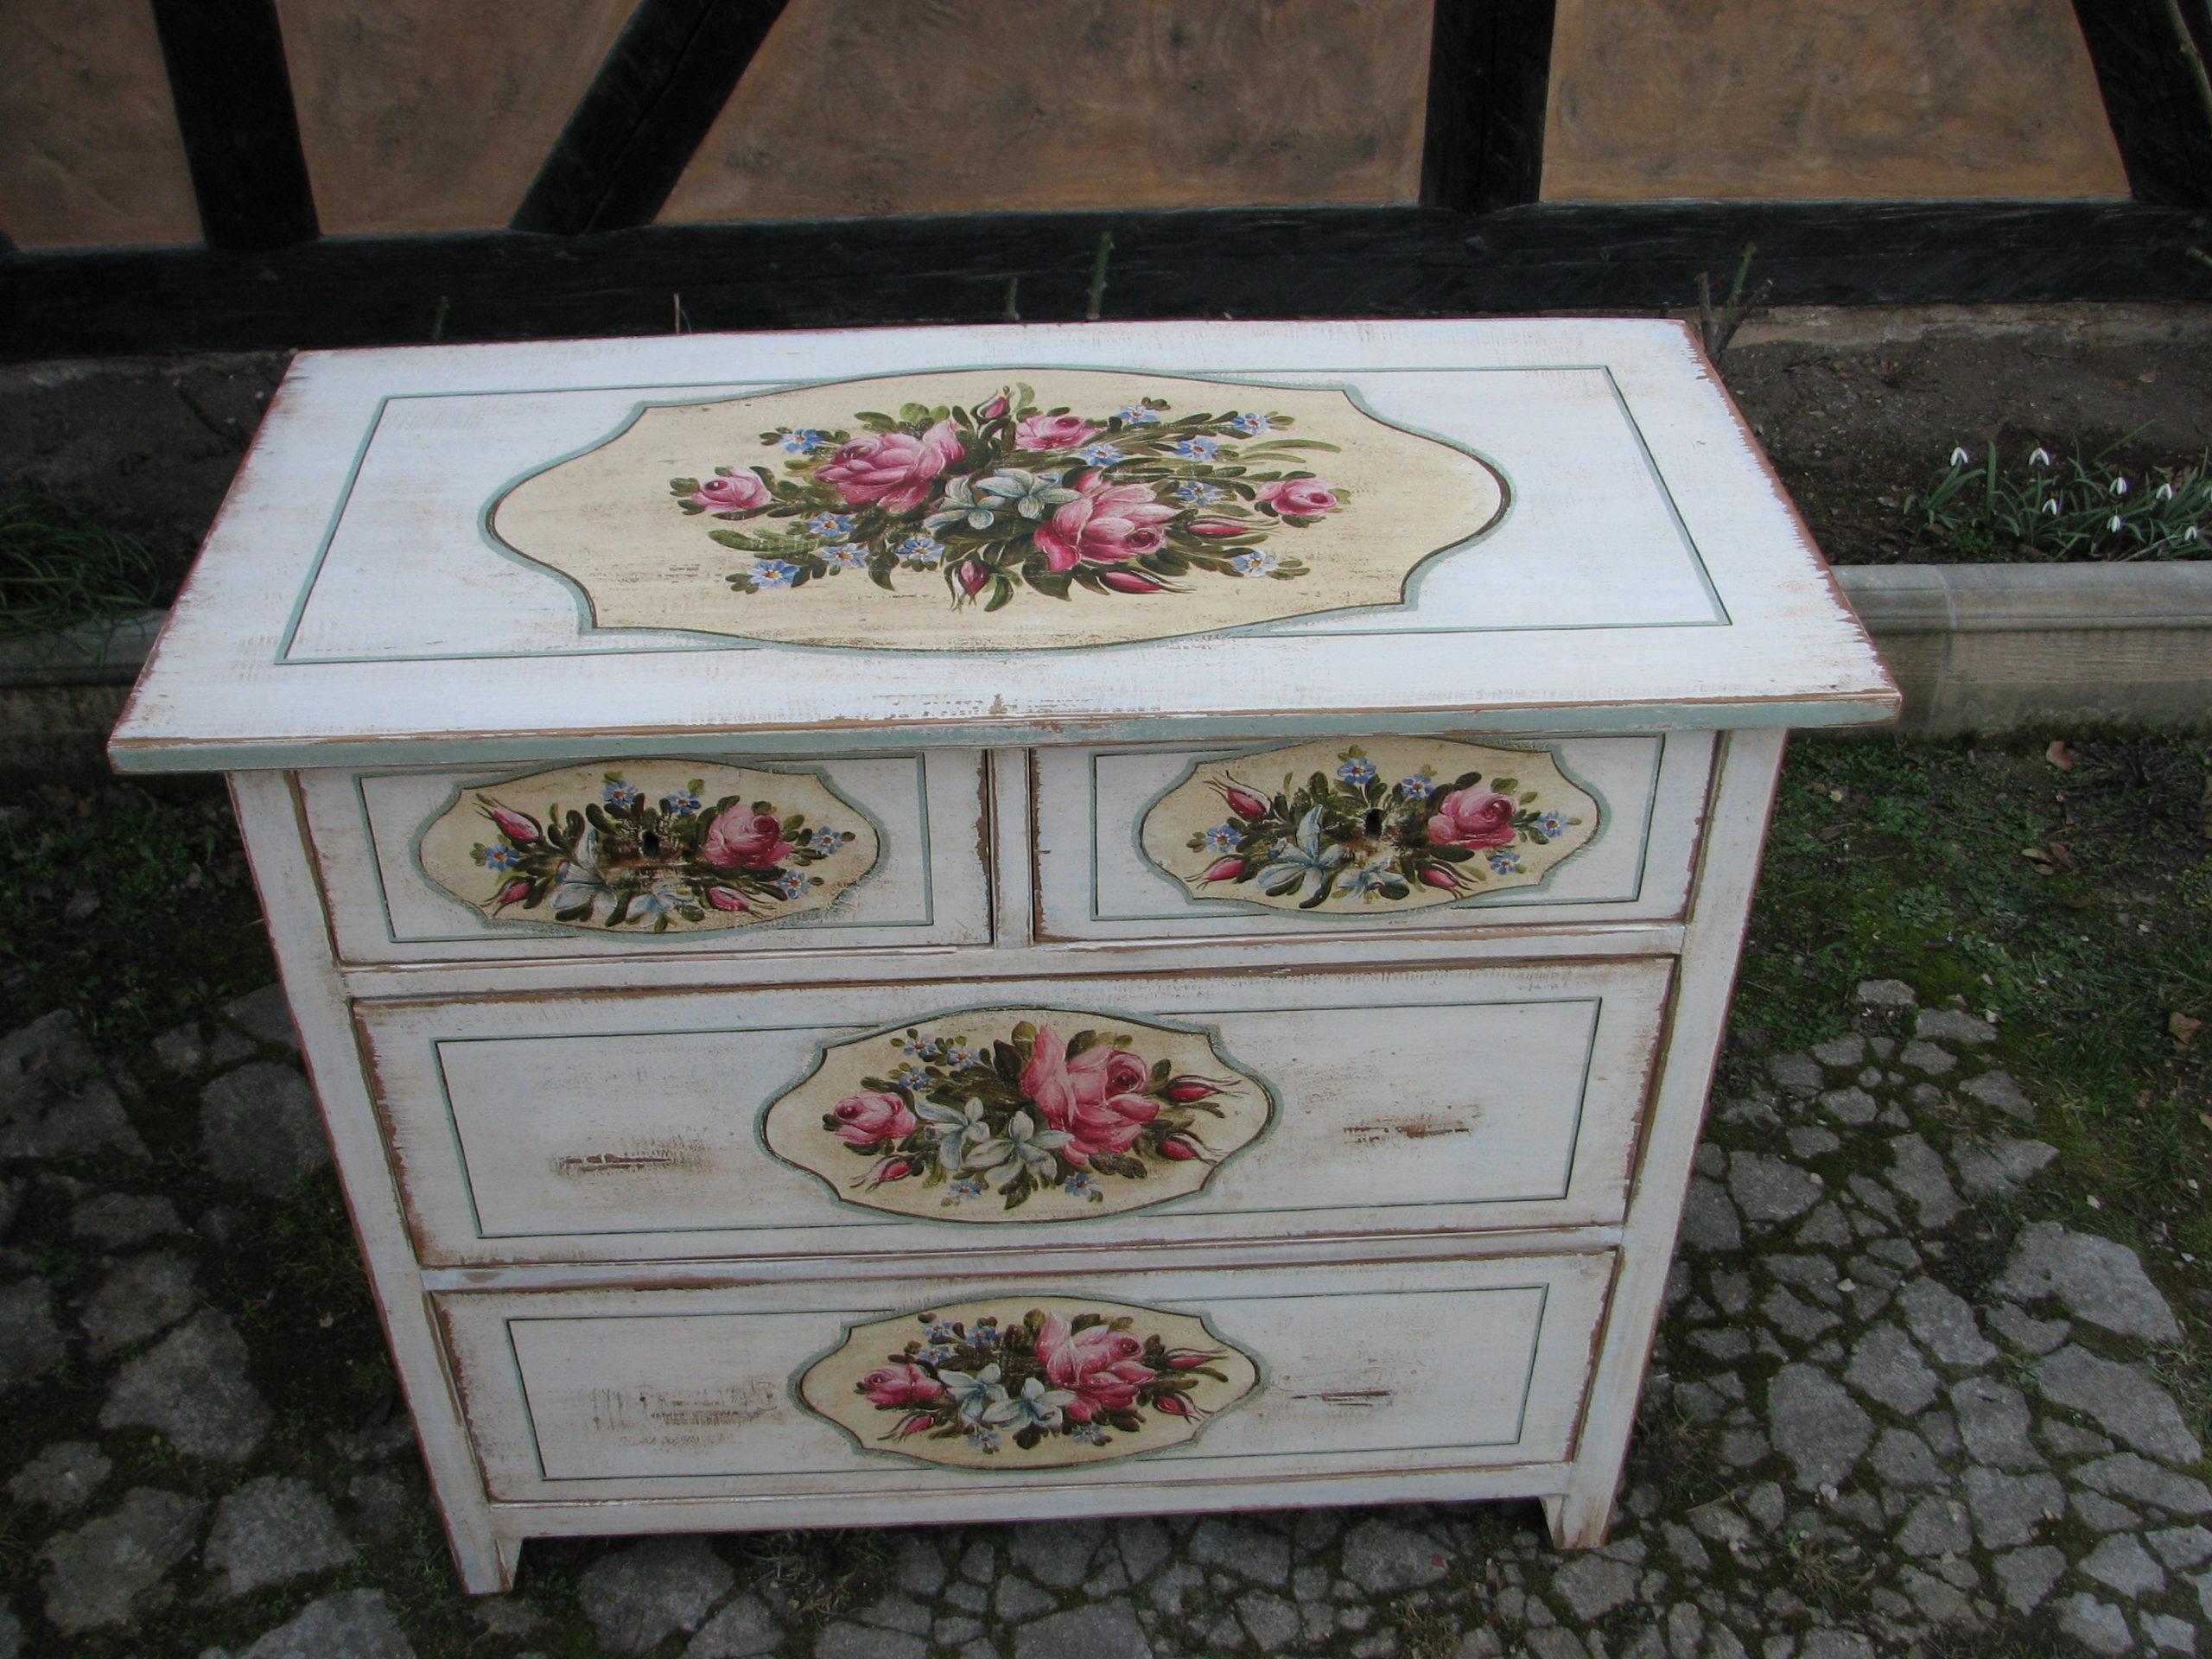 Malovaná bílá komoda s květinami v romantickém stylu 3